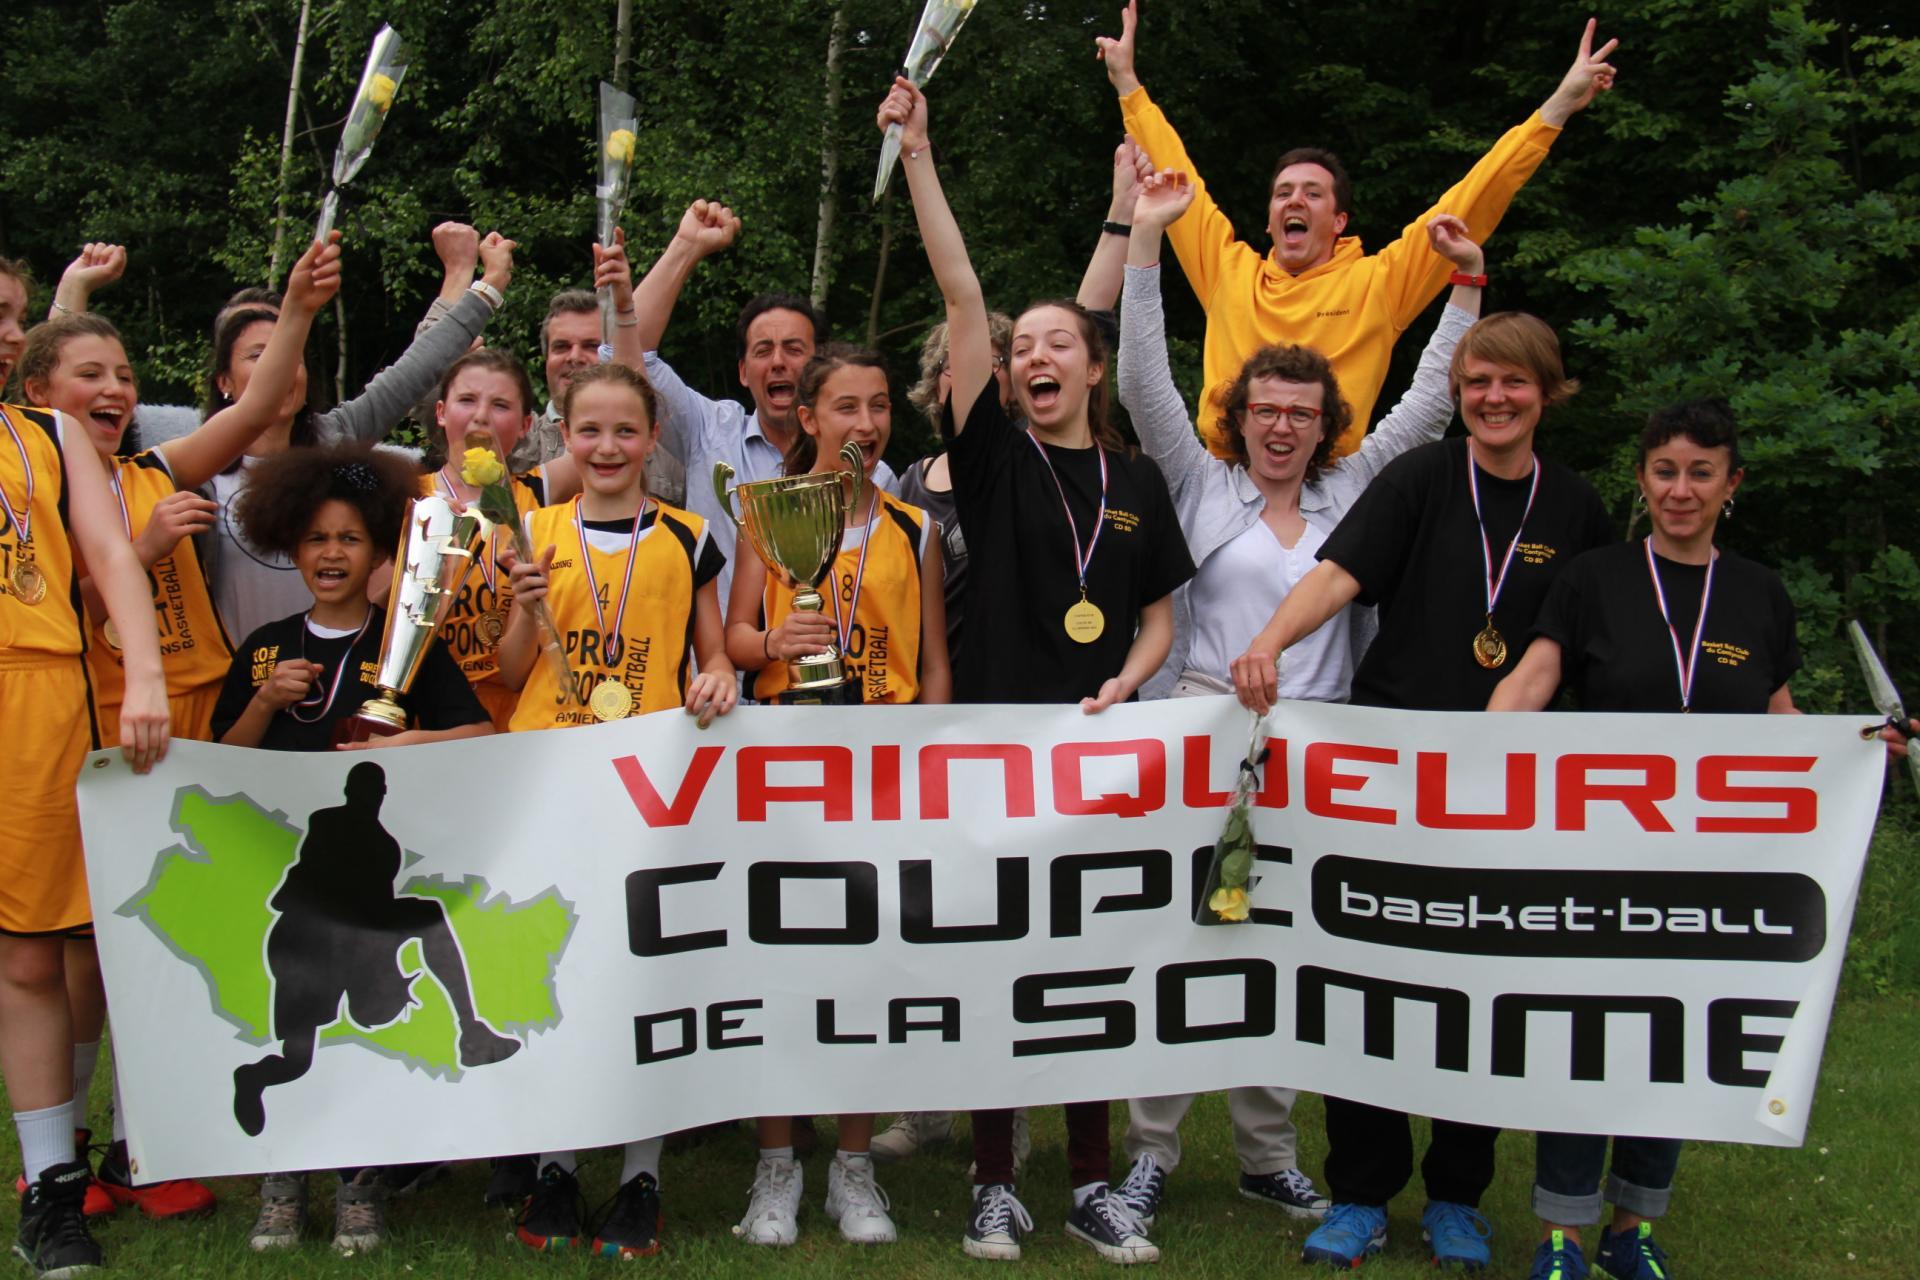 Championnes !!!!!!!!!!!!!!!